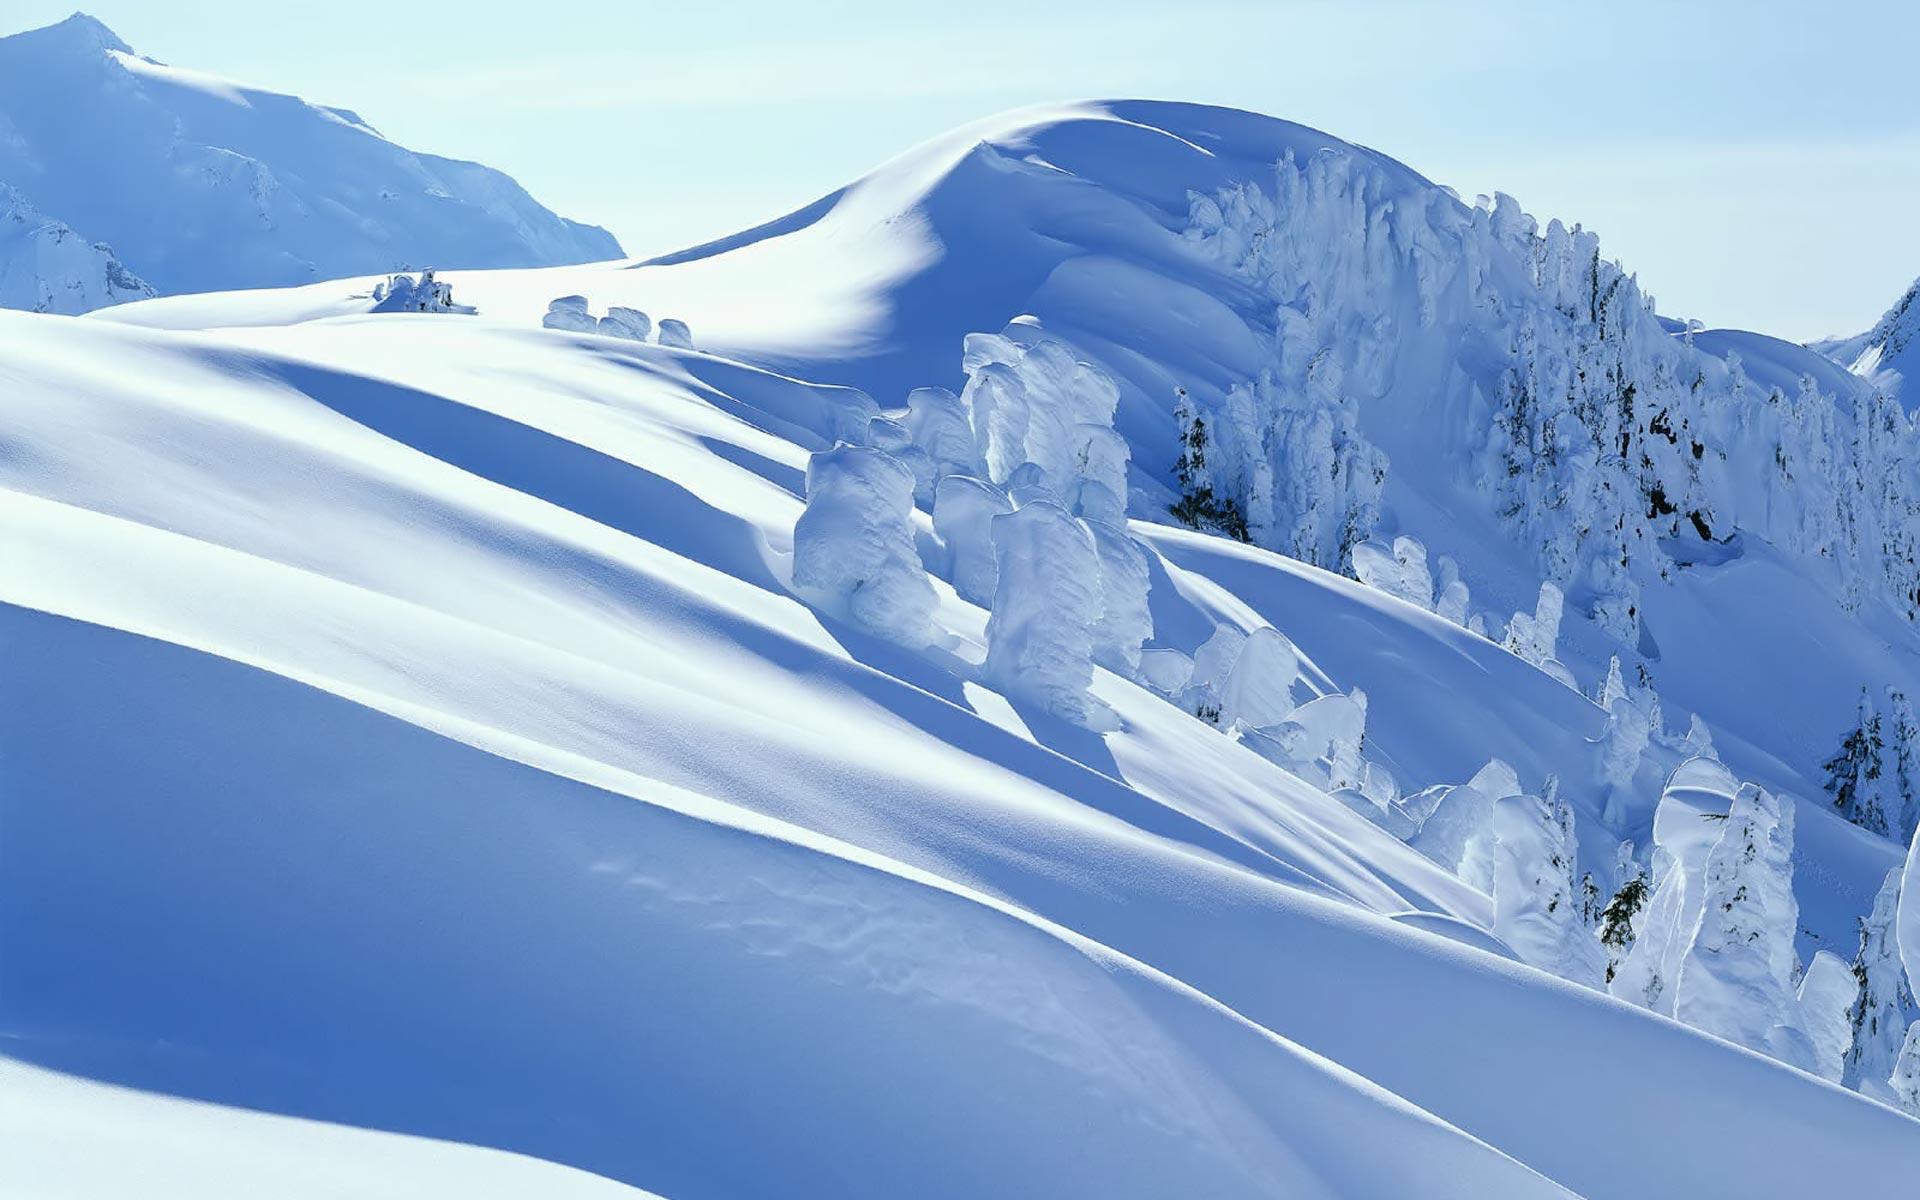 Snow Mountain Wallpaper 1920x1200 68874